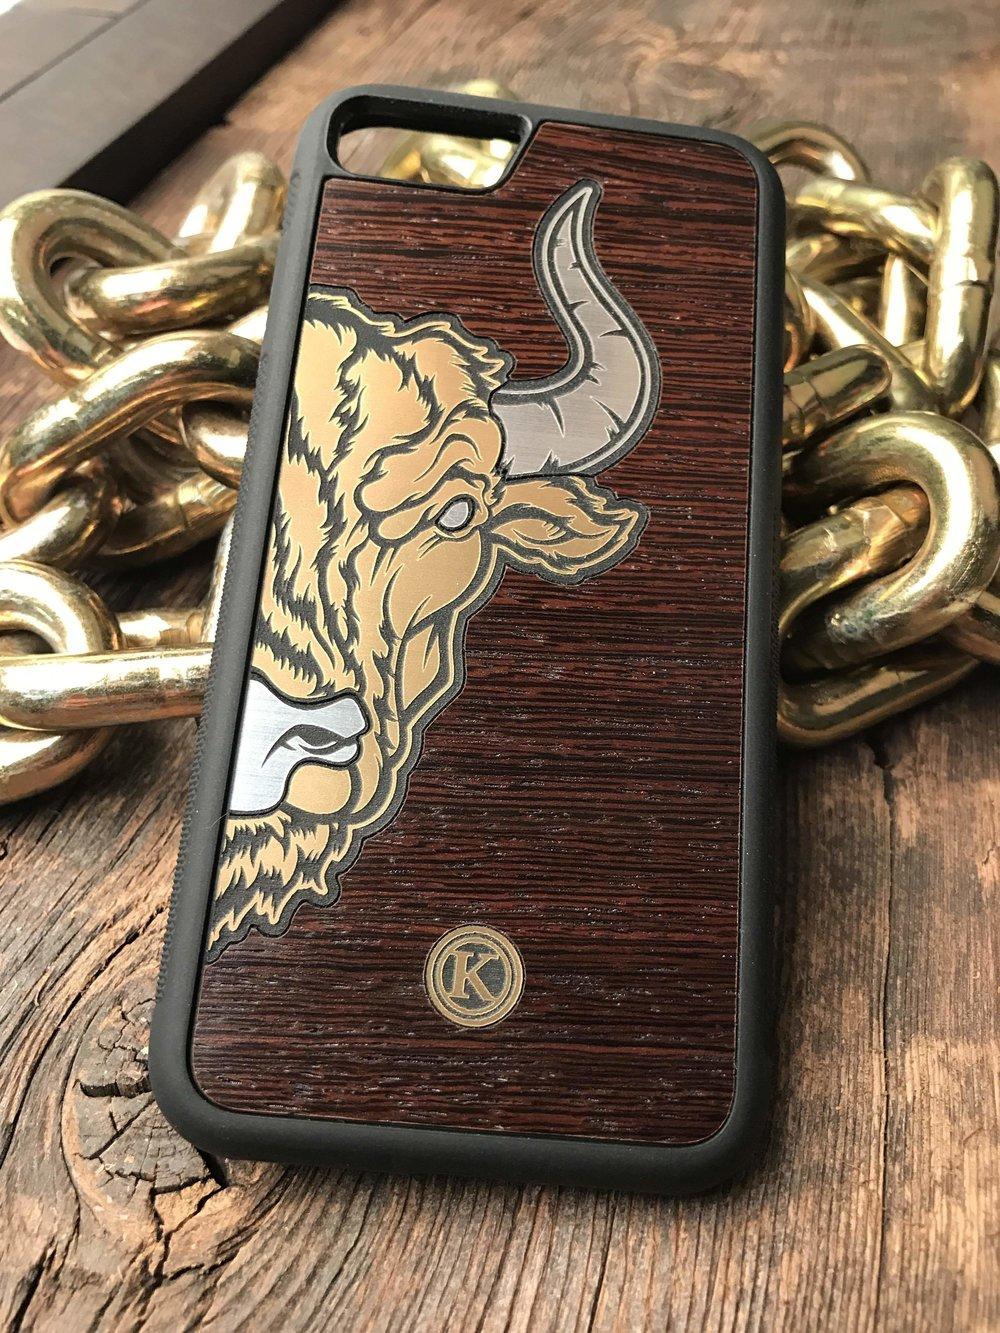 keywaydesign-keyway-design-gold-silver-wood-rubber-iphone-case-bull-beast-orozcodesign-ods-roberto-orozco-artist-horns.jpg